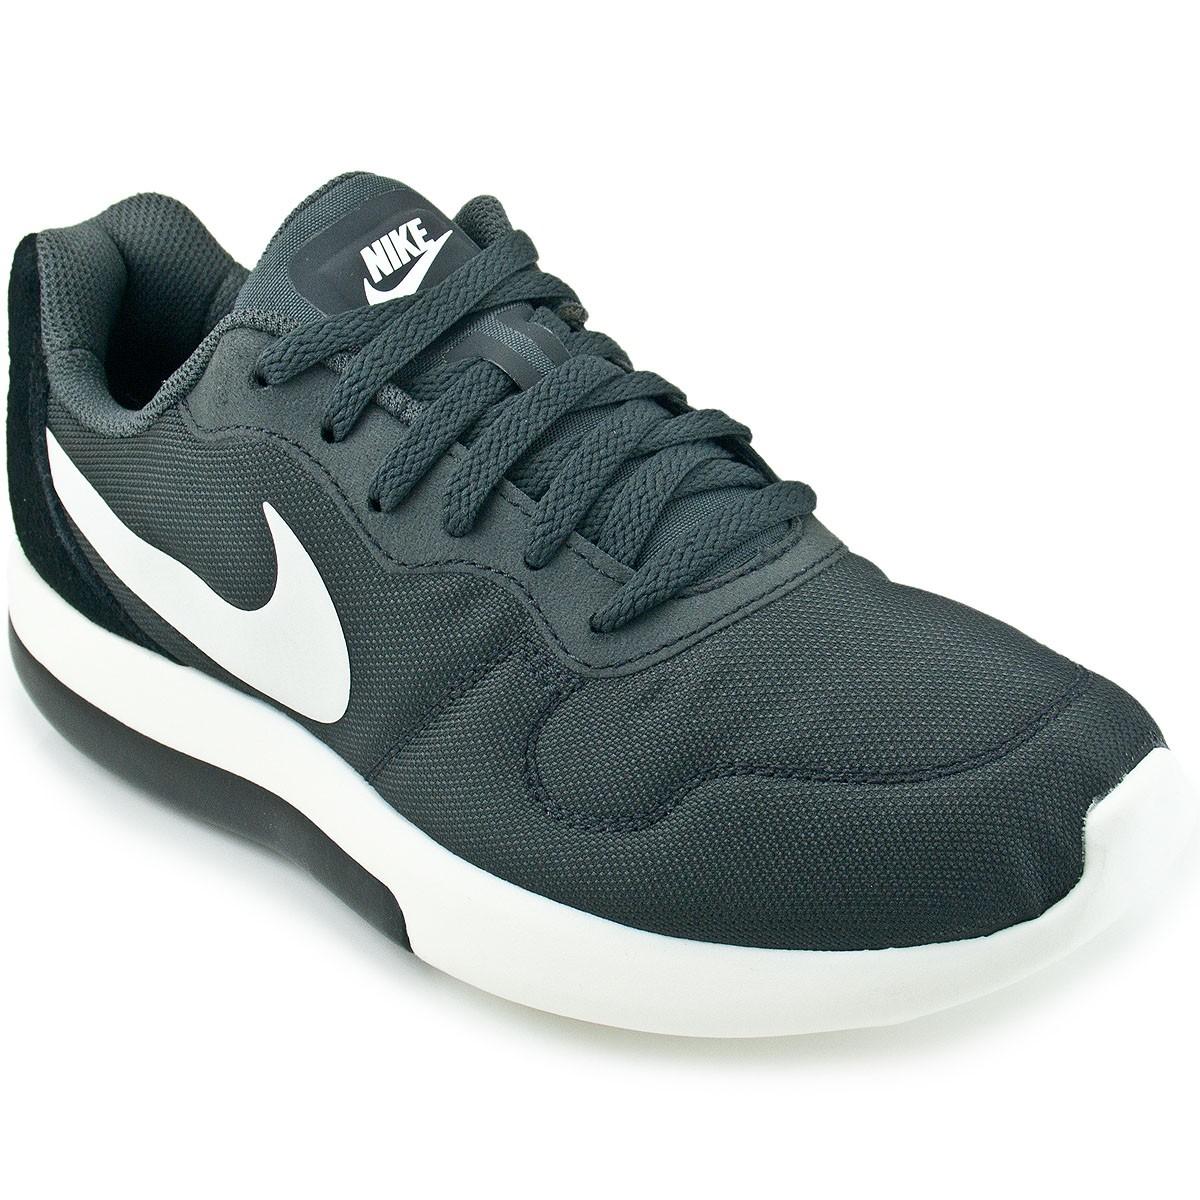 89c9dcf9ad Tênis Nike MD Runner 2 LW W 844901